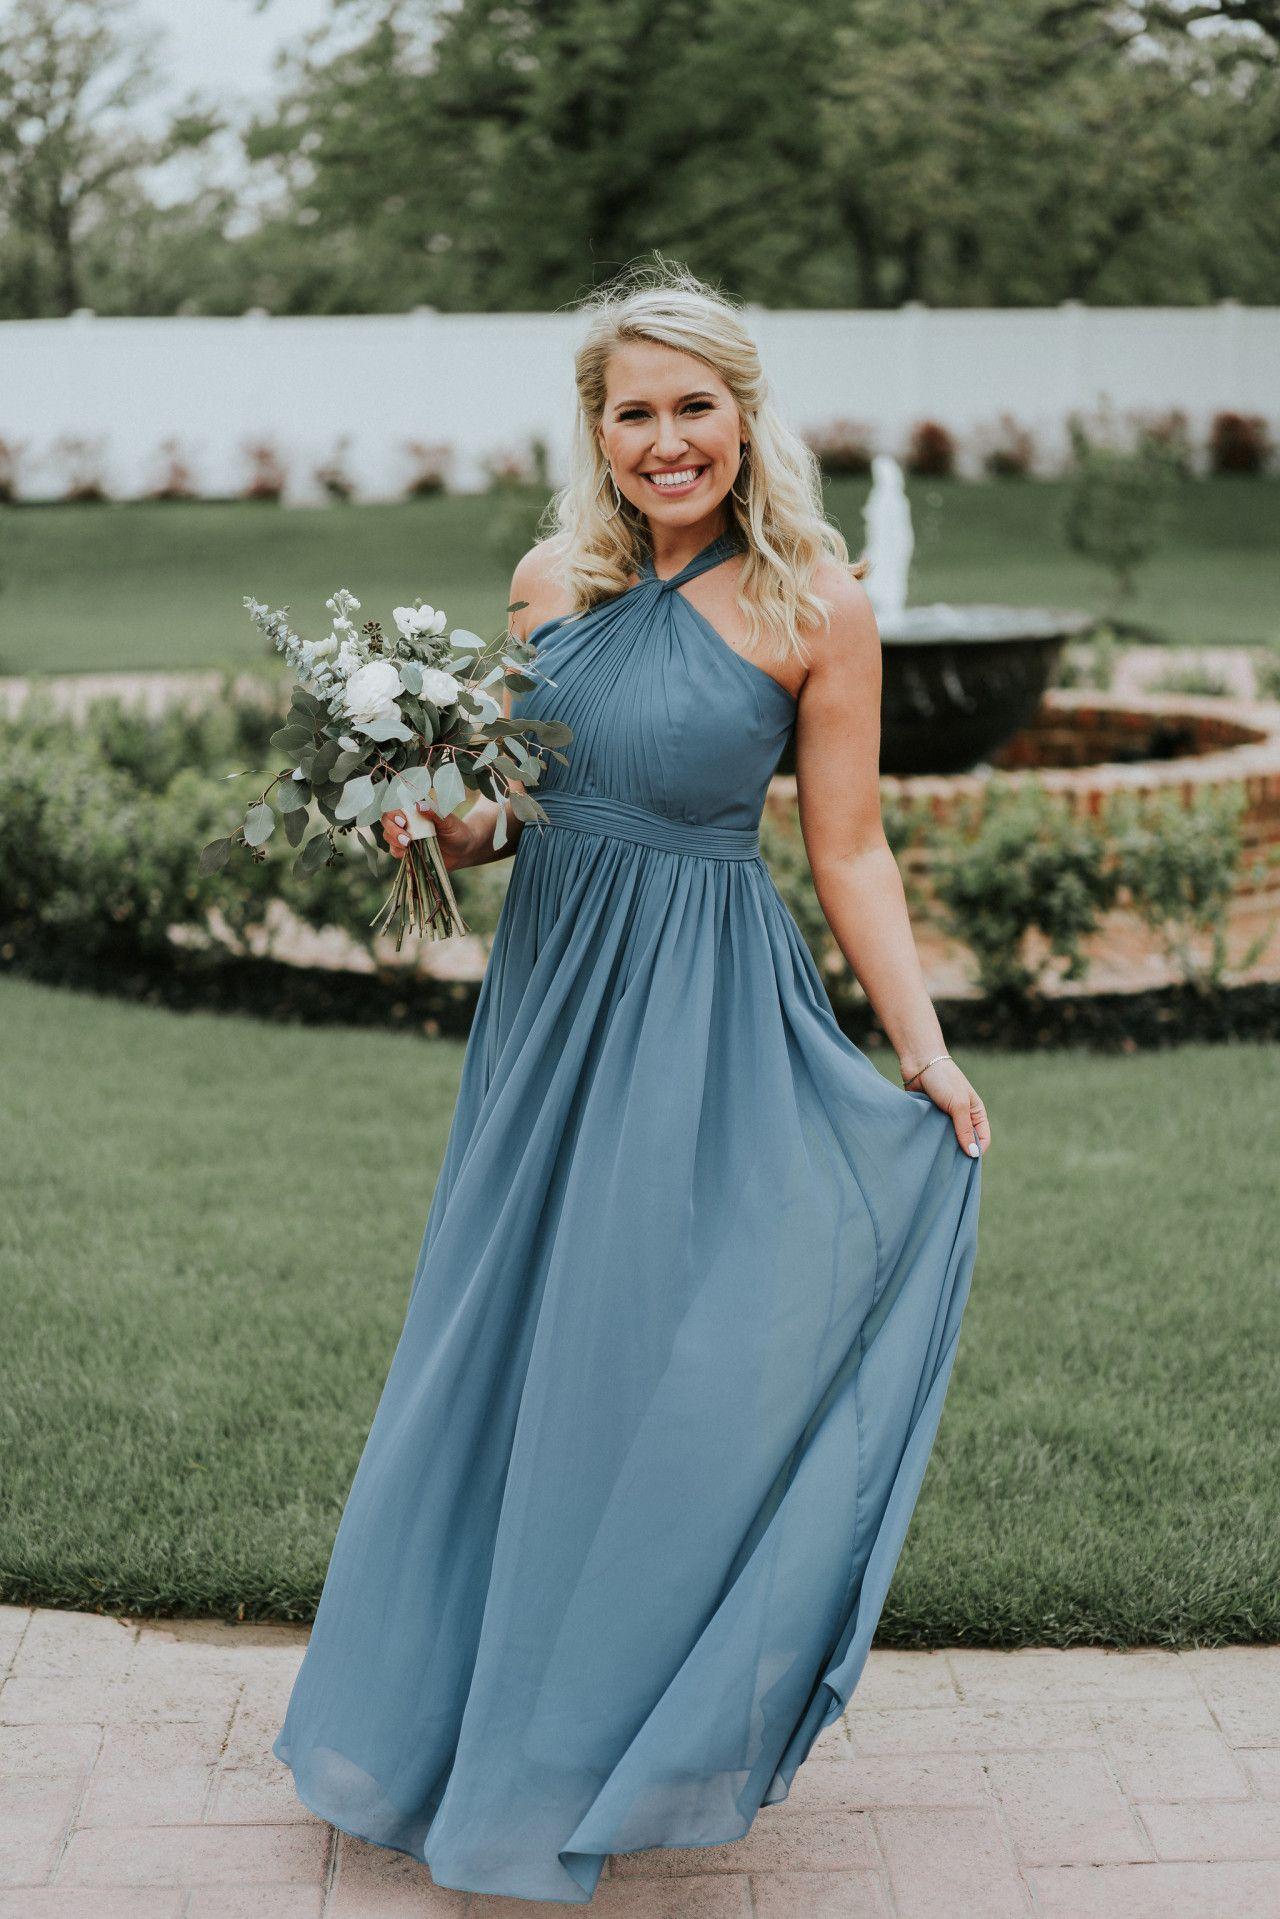 Dusty blue bridesmaid dress elegant wedding color ideas elegant